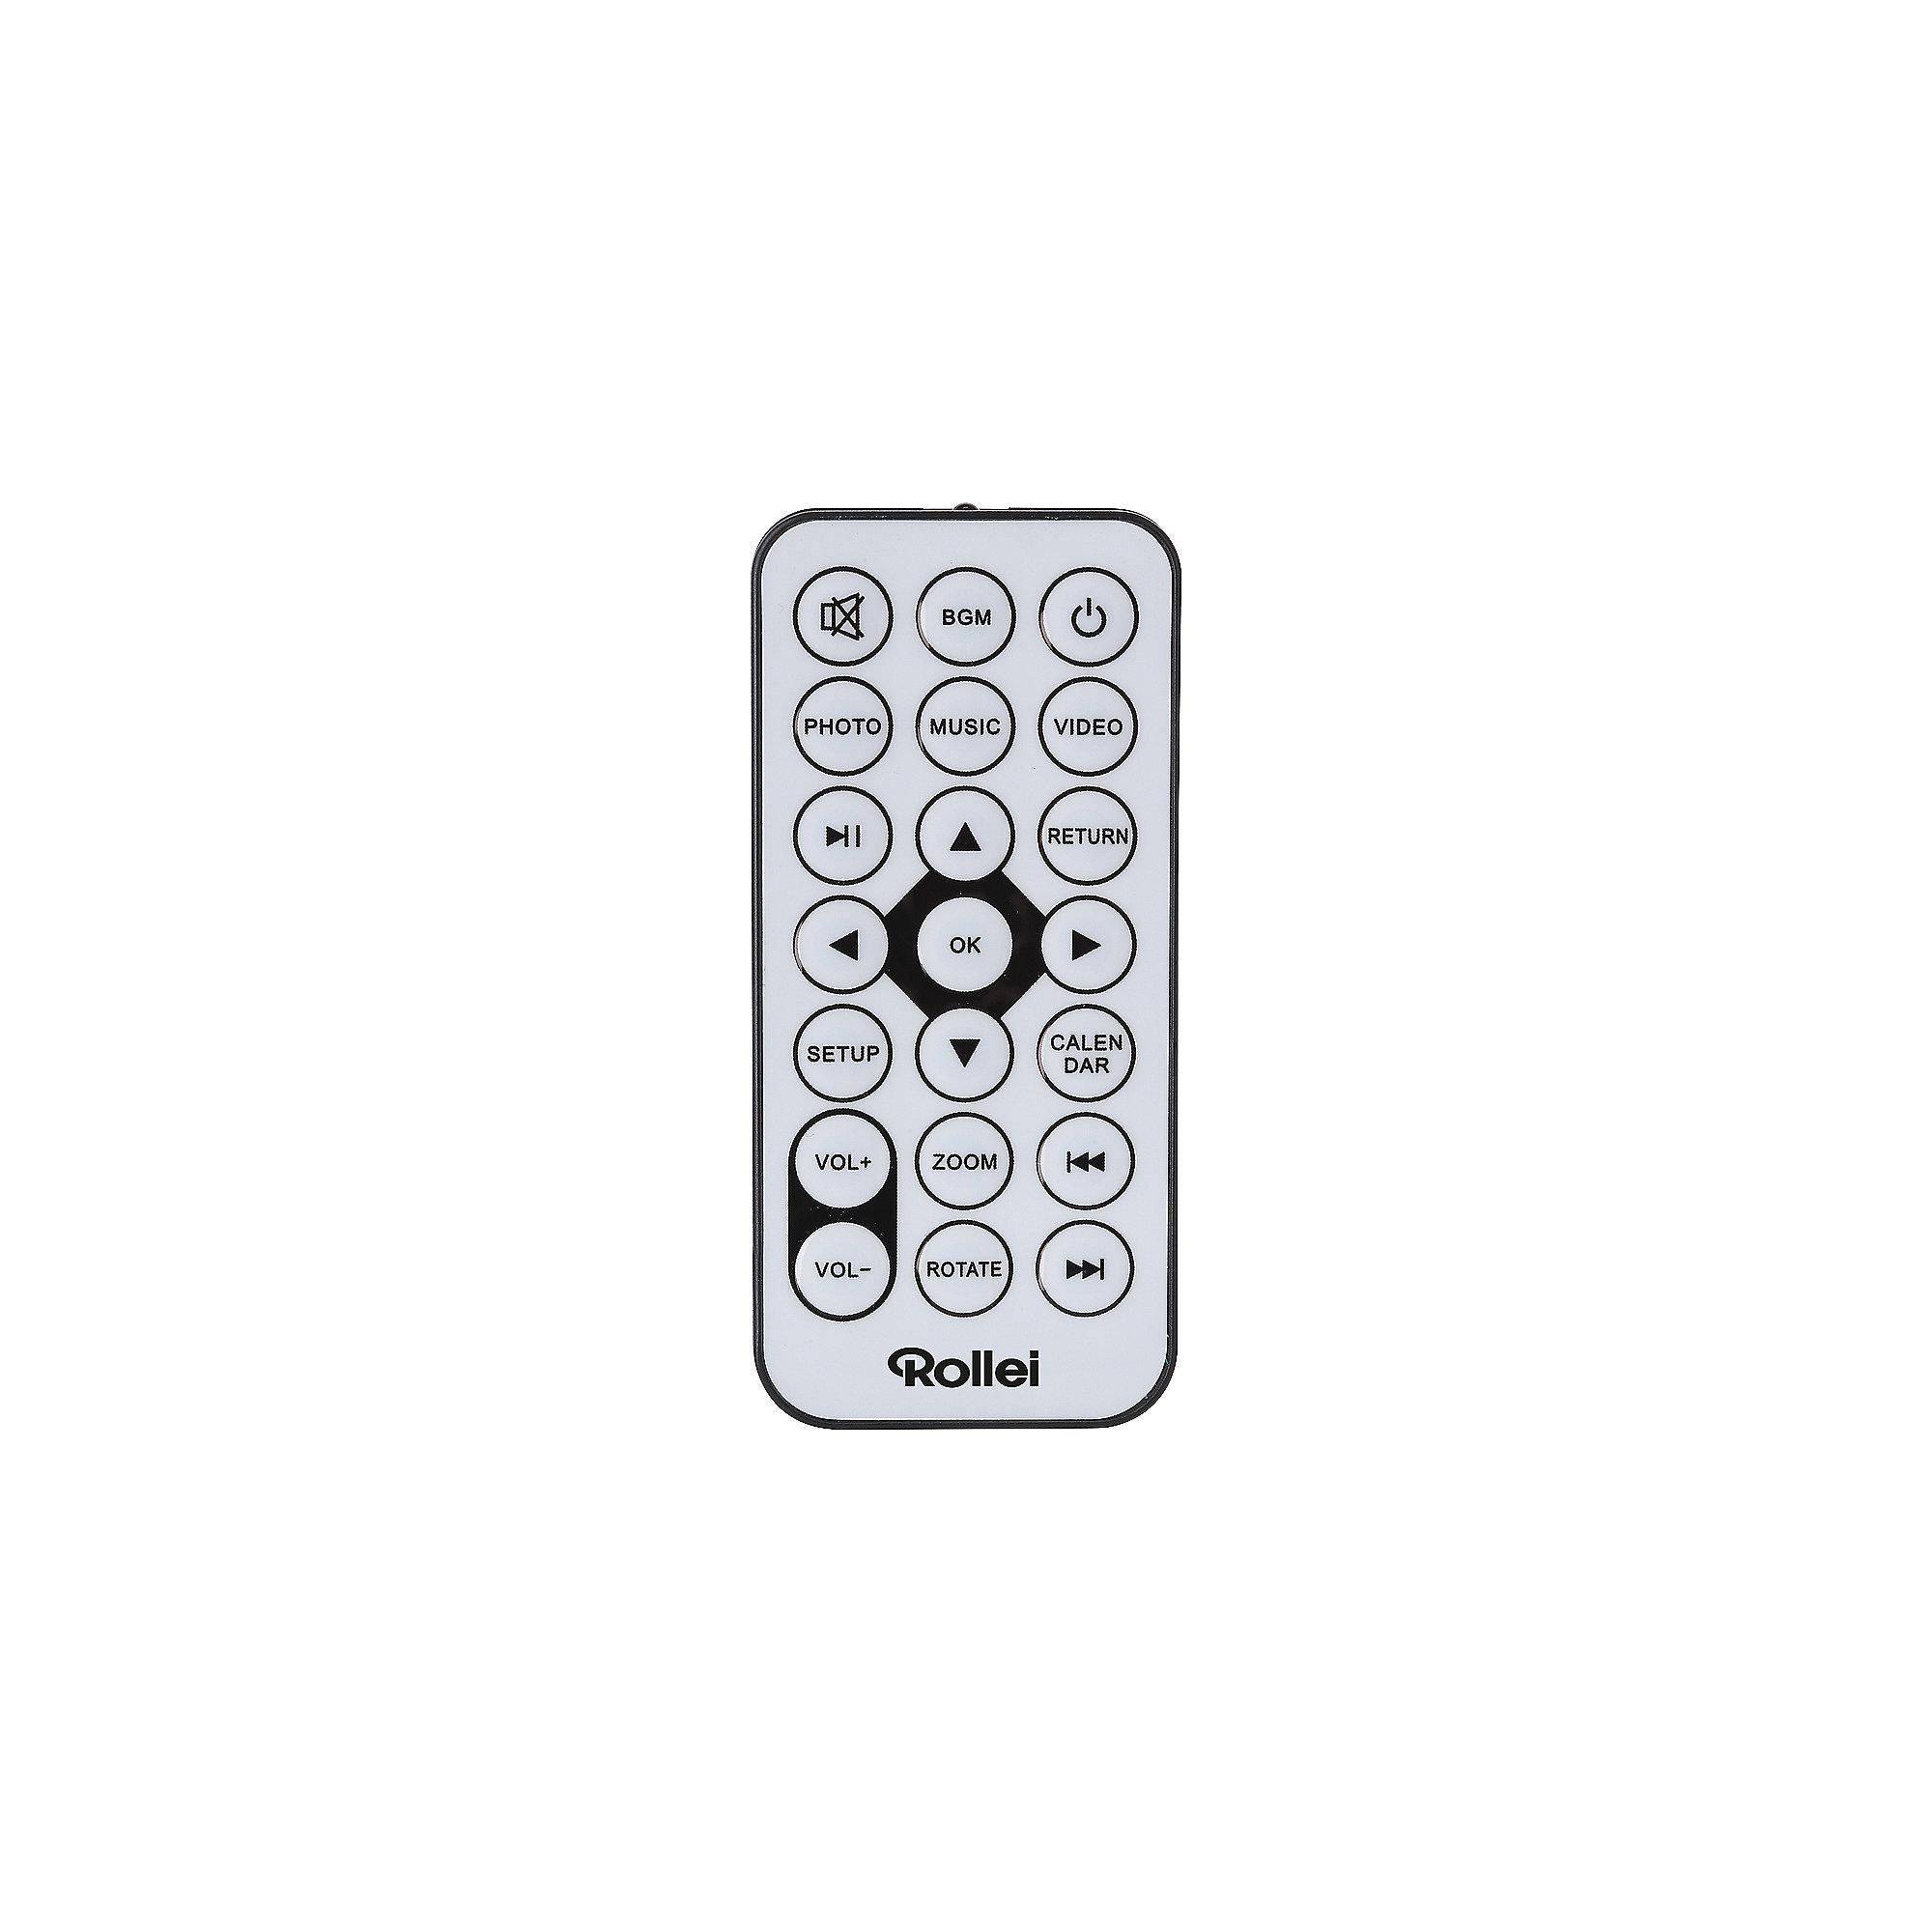 Rollei Degas DPF-850 digitaler Multimedia-Bilderrahmen 20,3 cm (8 ...